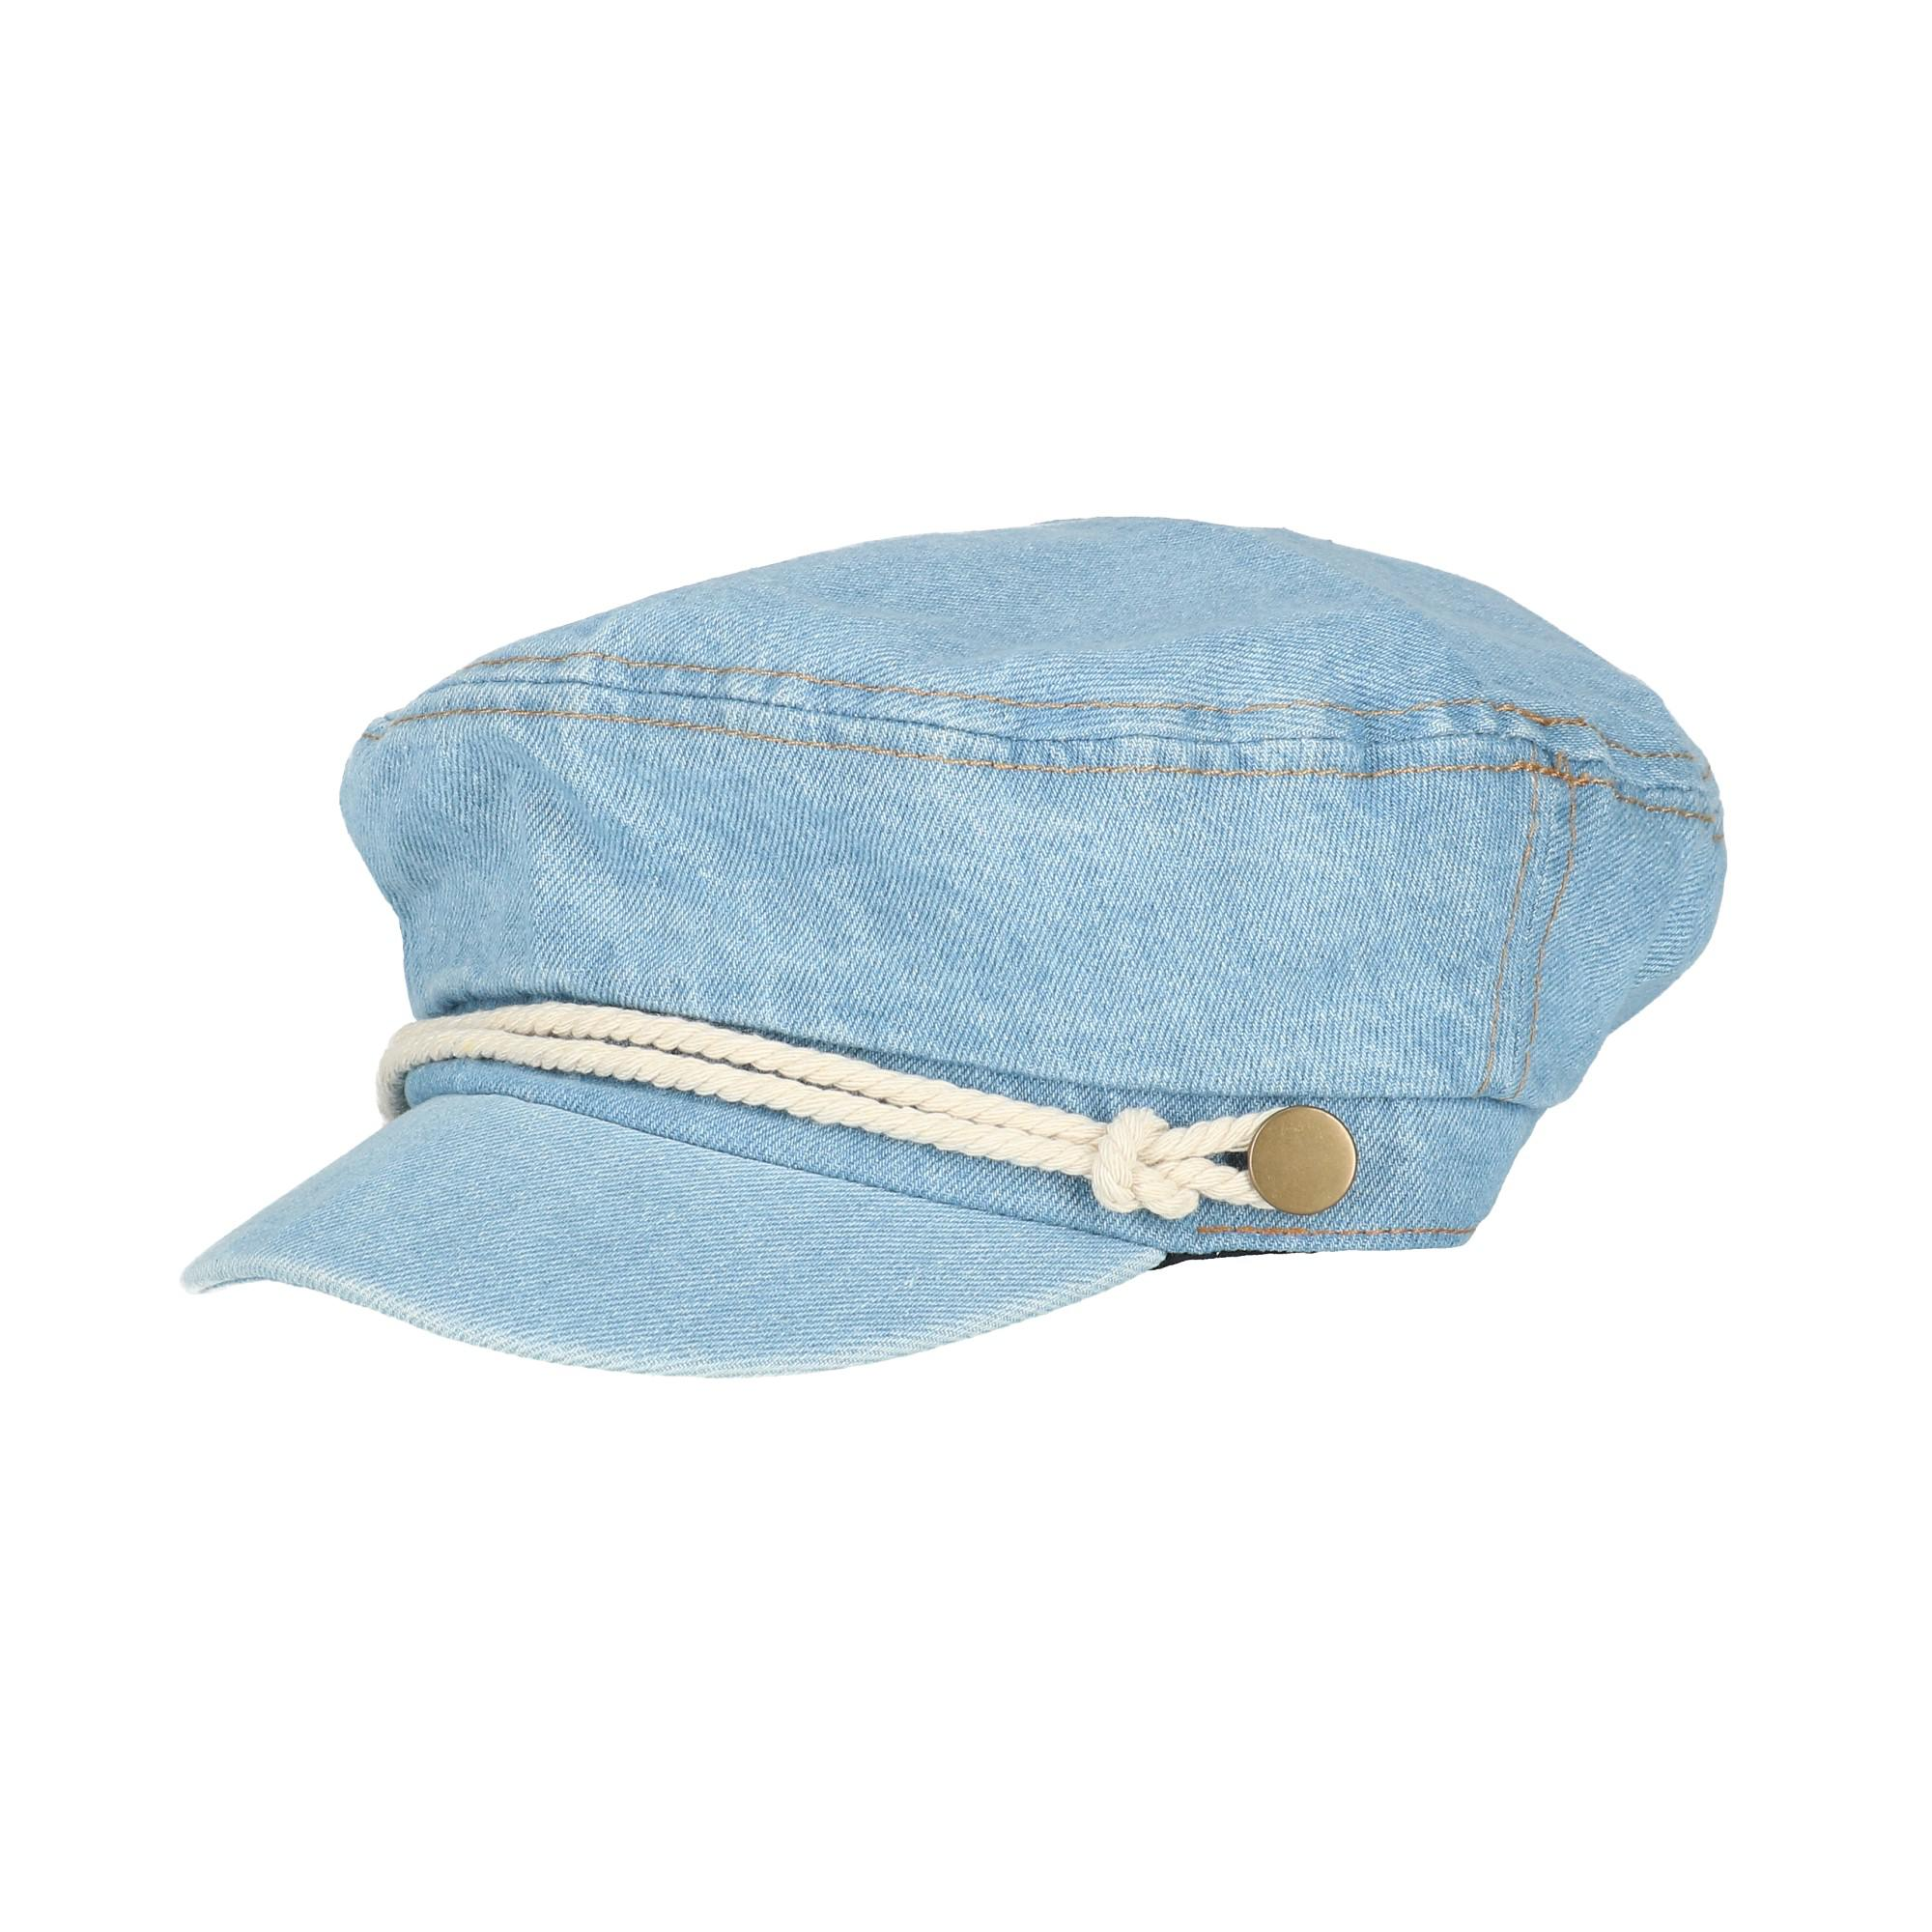 3a4bcecf0 Women's Hats & Caps | Walmart Canada